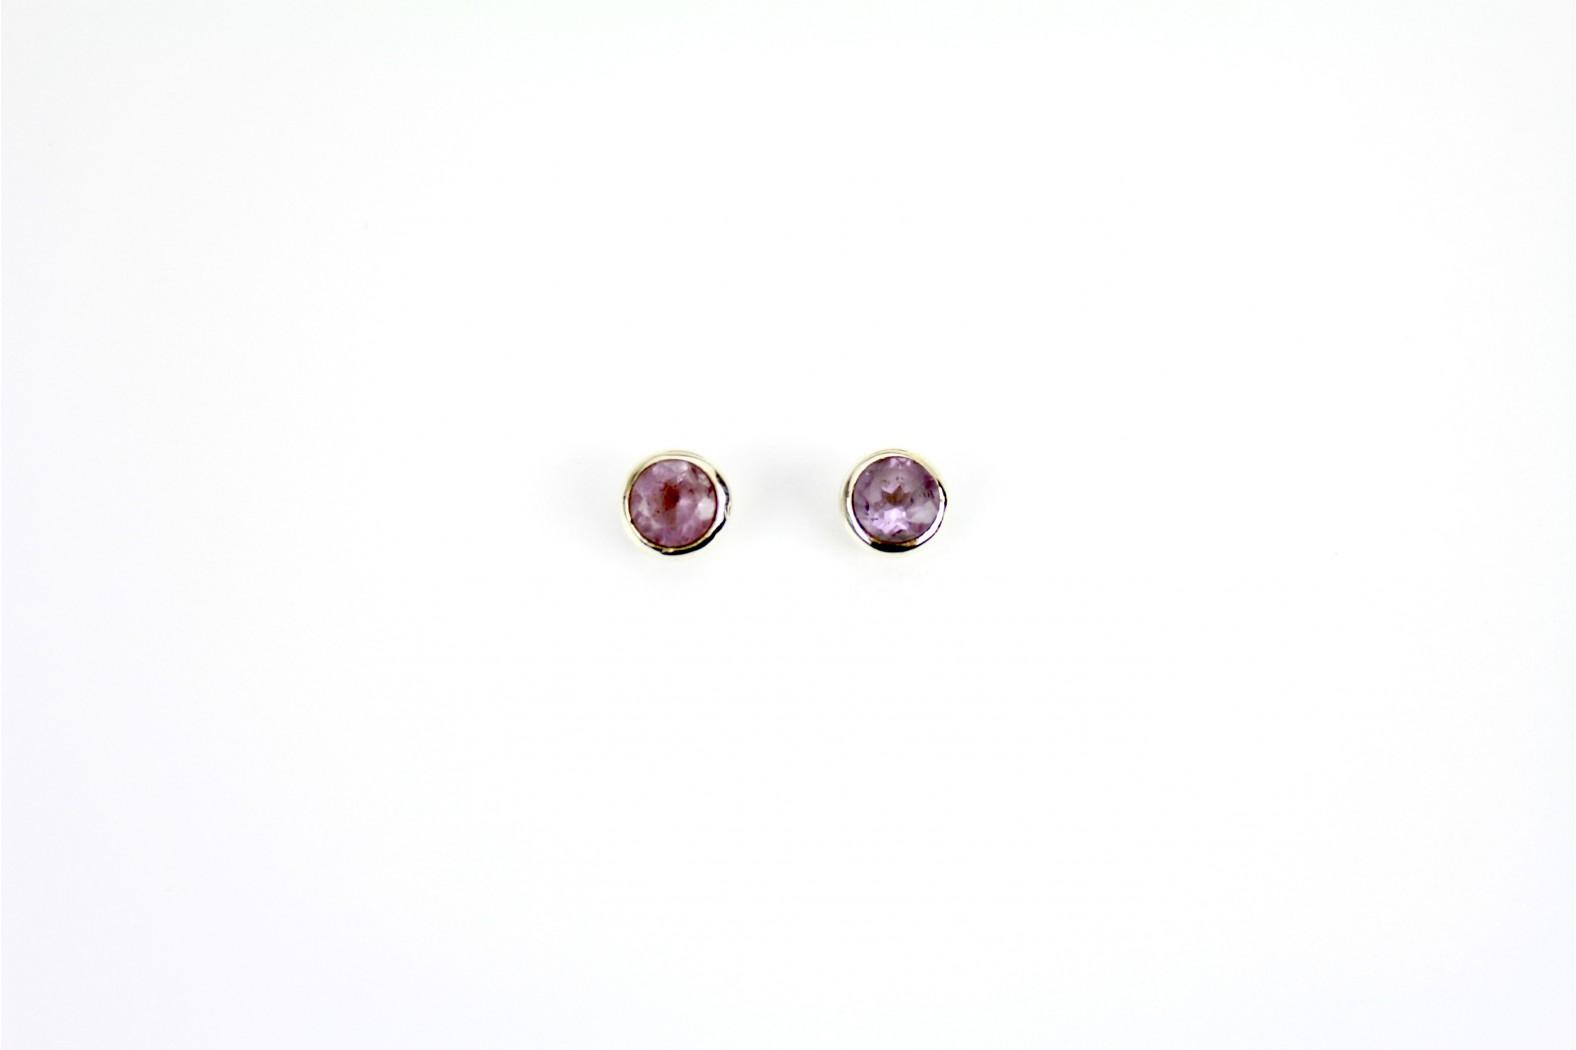 Circular Amethyst stud earrings set in circular silver mounting